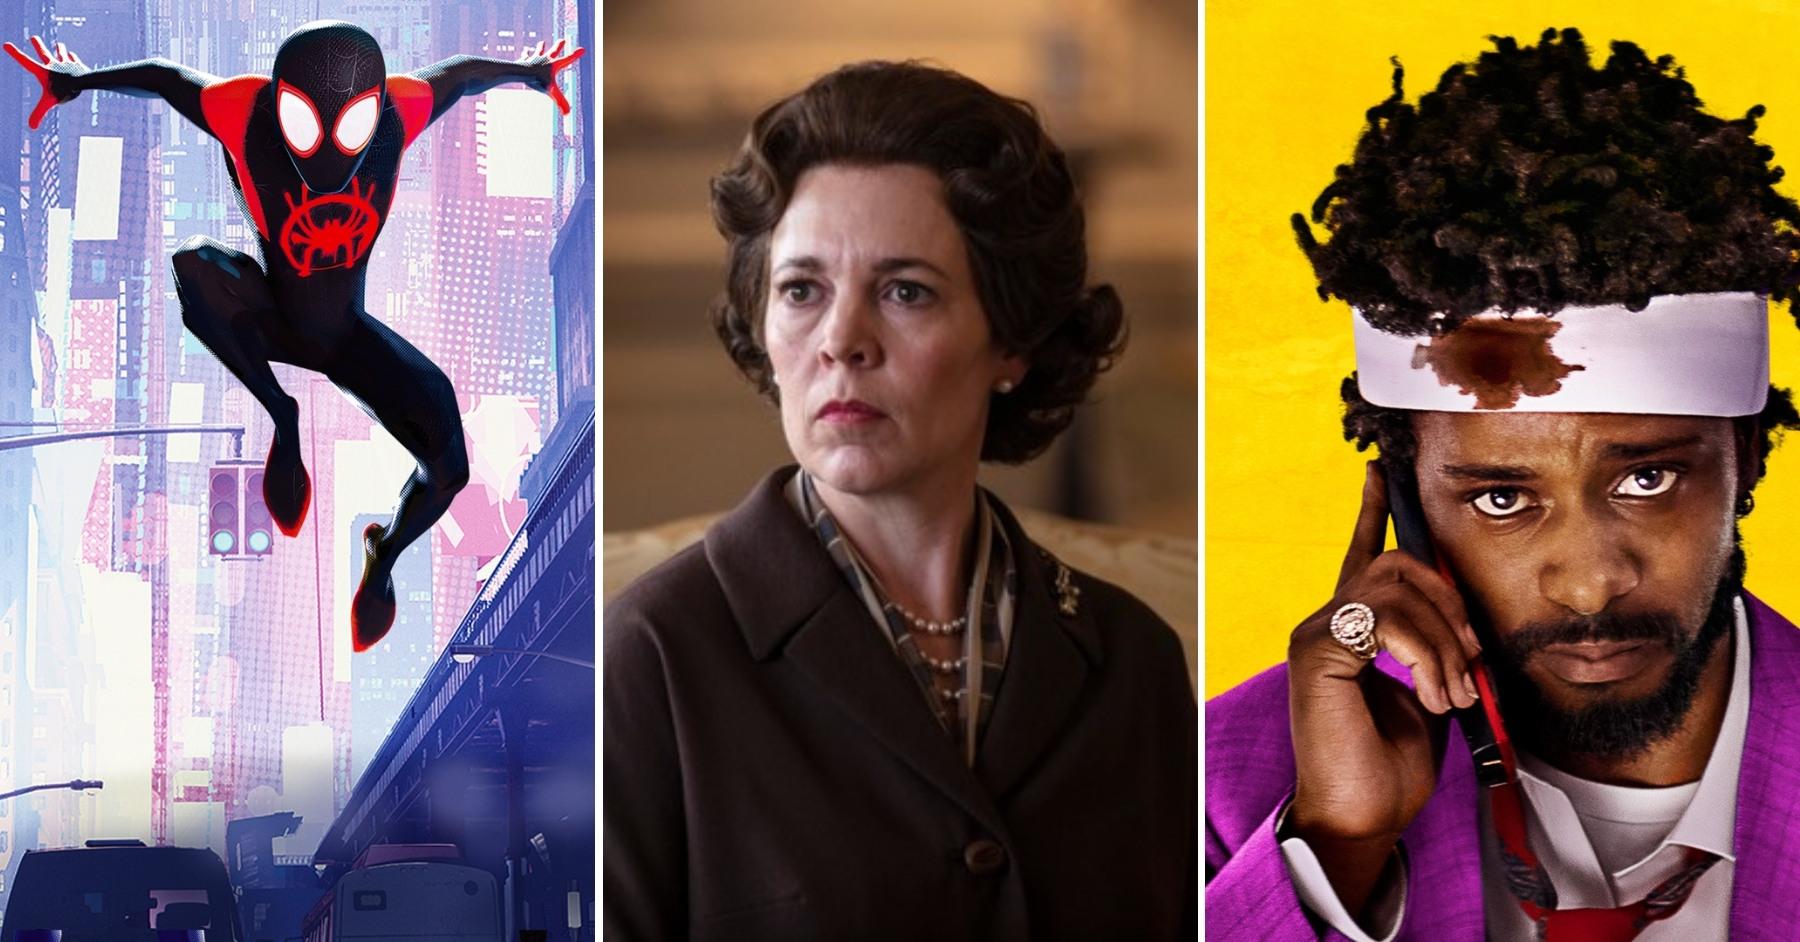 What's On Netflix UK in November 2020